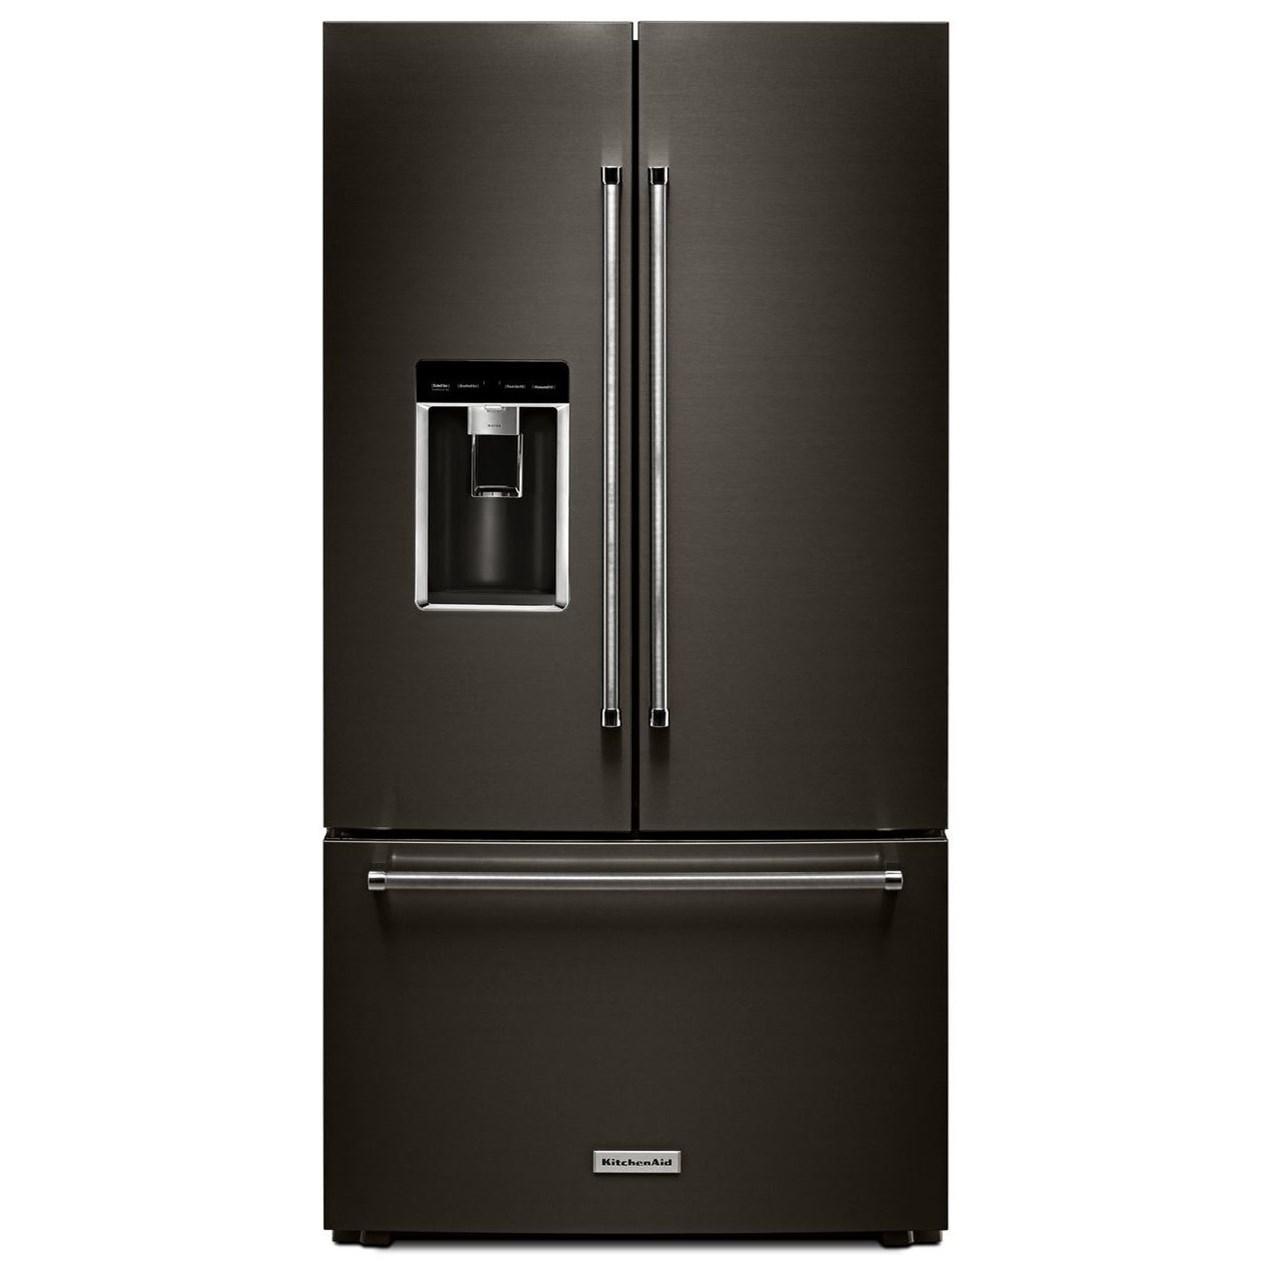 Image Result For Kitchenaid Refrigerator Warranty